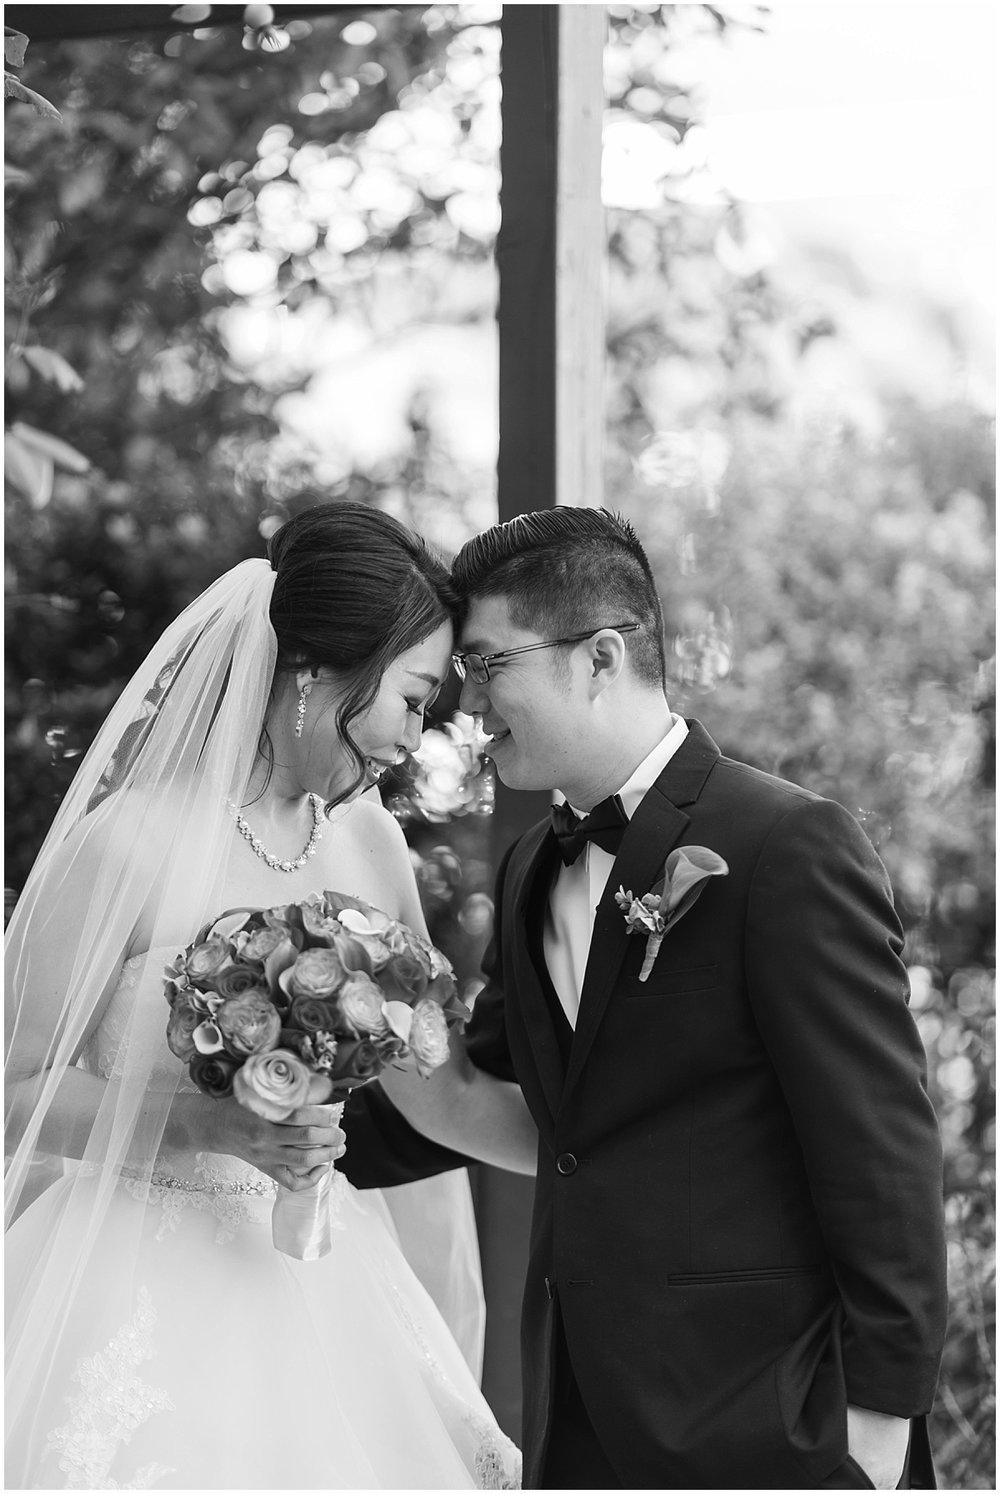 Faith-and-Flower-Wedding-Soo-Dan-Carissa-Woo-Photography_0041.jpg